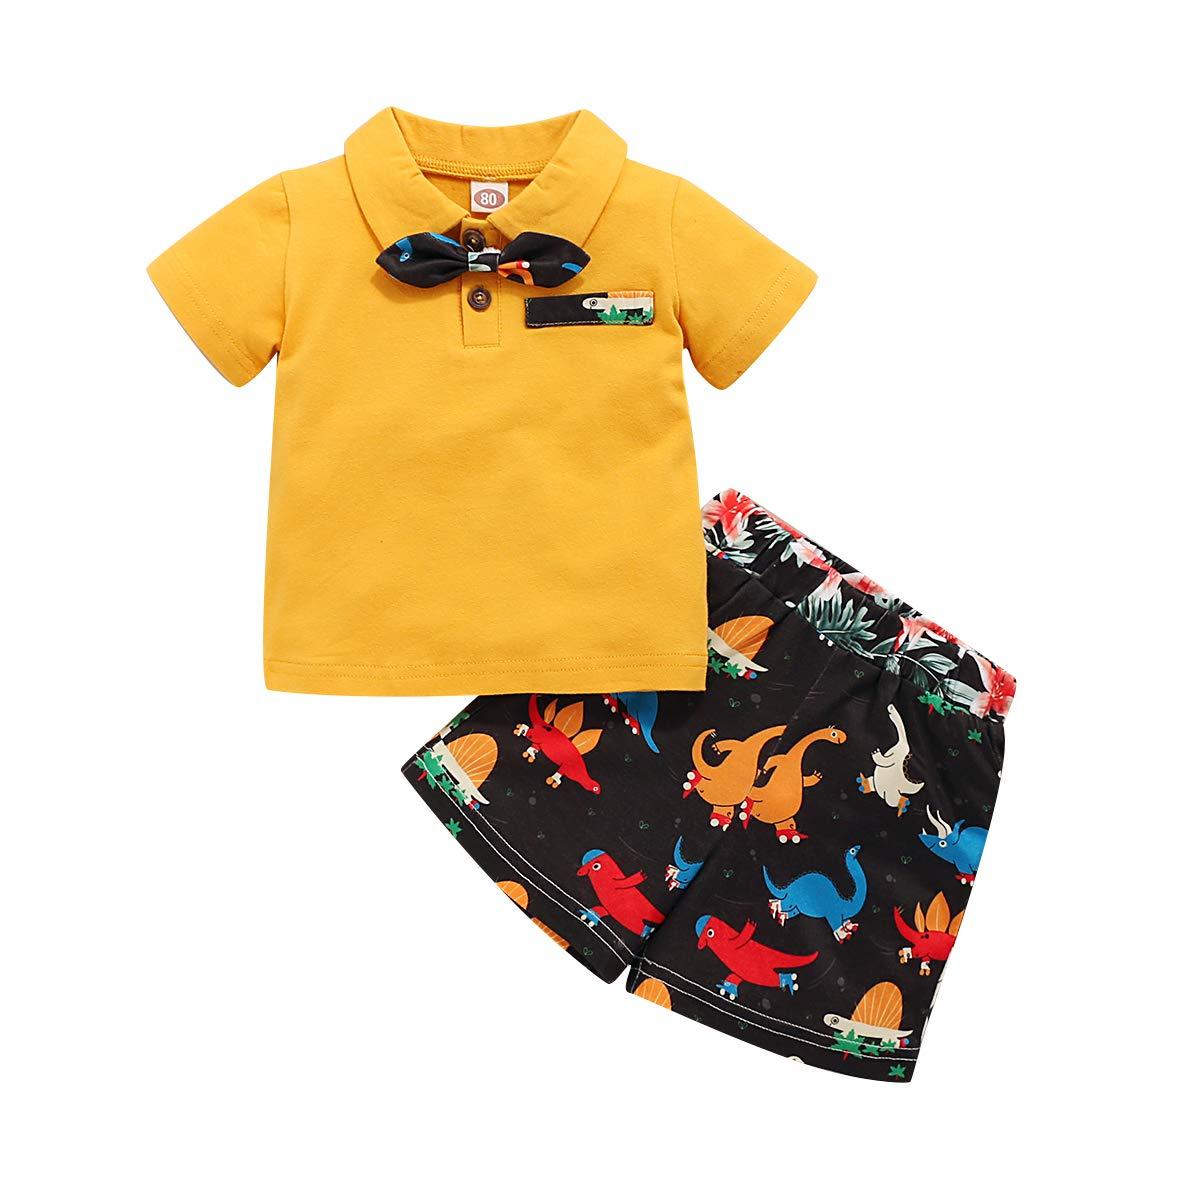 bilison Baby Boy Summer Clothes Button Bowtie Short Sleeves Tops + Camouflage Pants 2Pcs Outfit Set